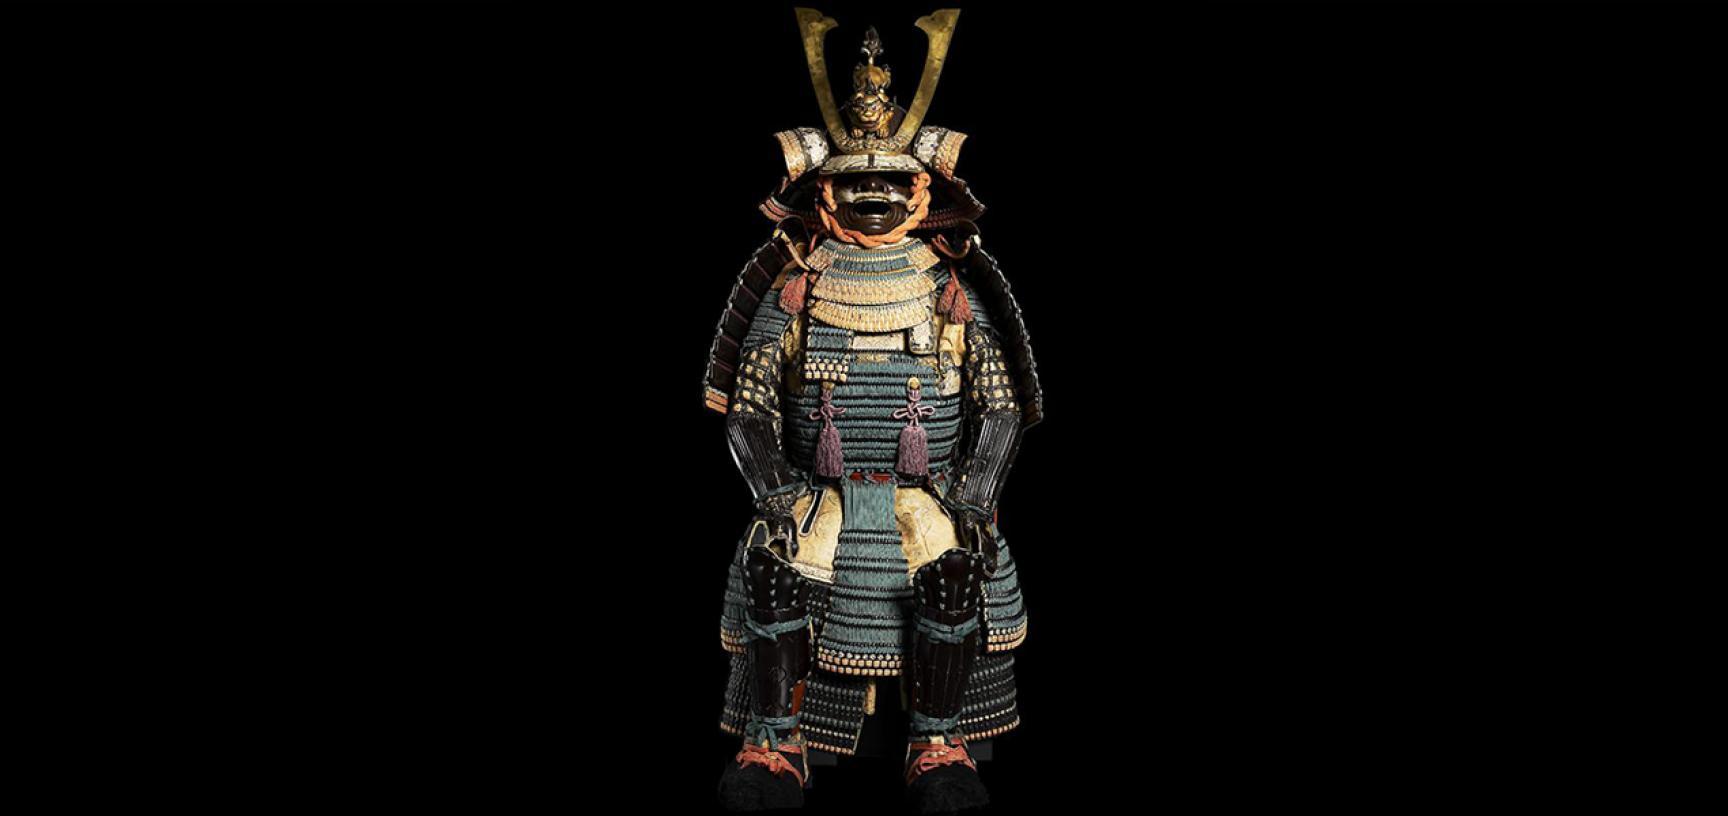 Ceremonal suit of armour for a samurai